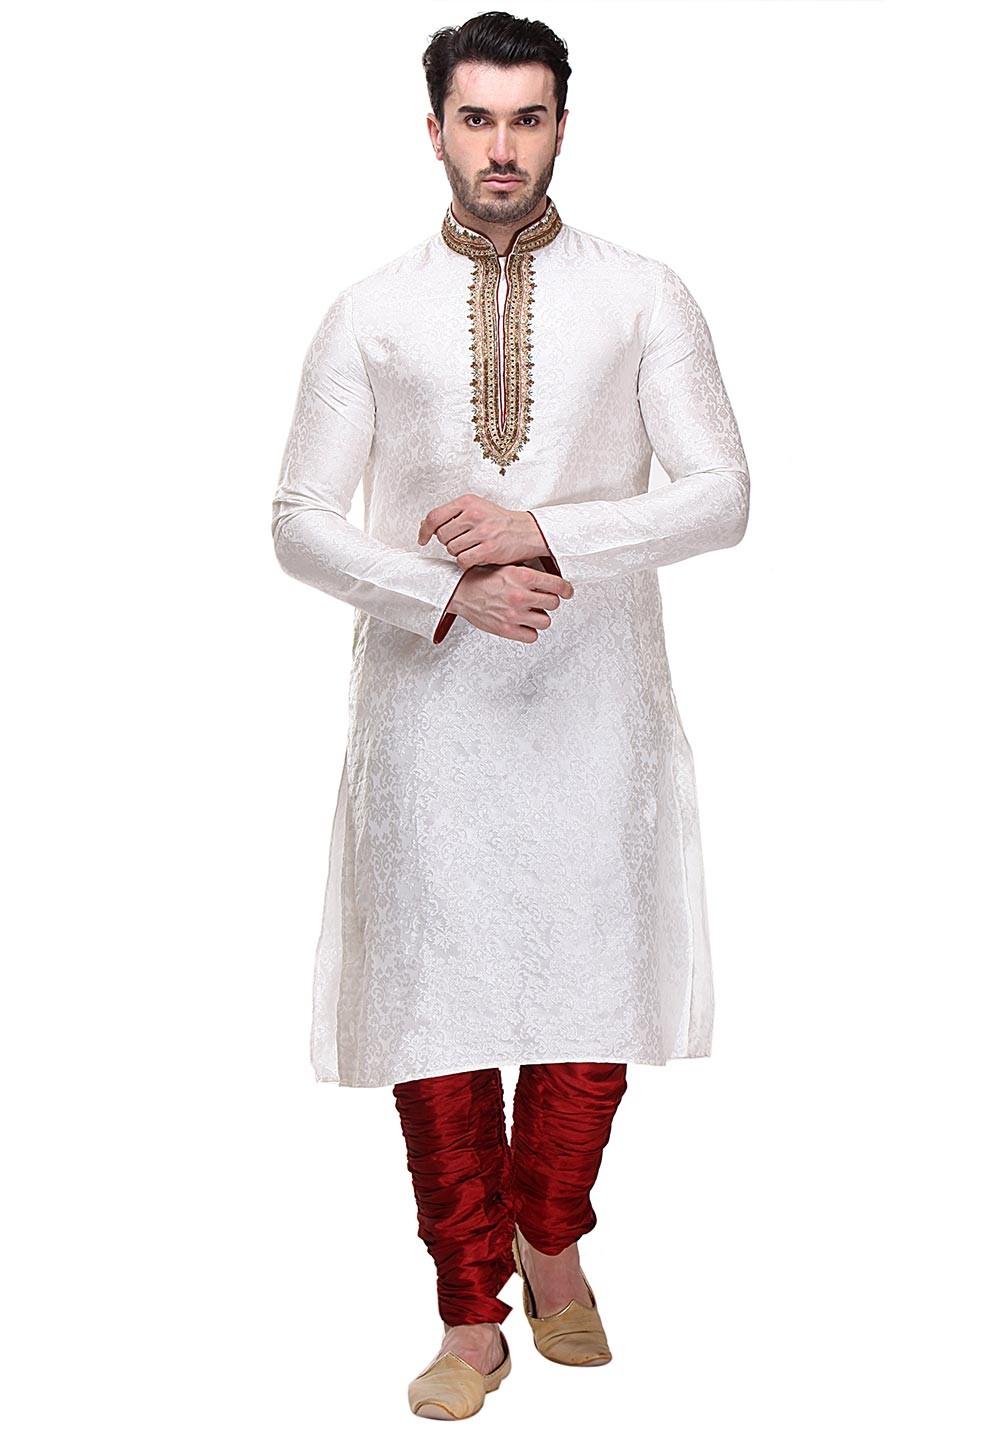 Exquisite Cream Color Brocade Fabric Readymade Kurta Pajama.